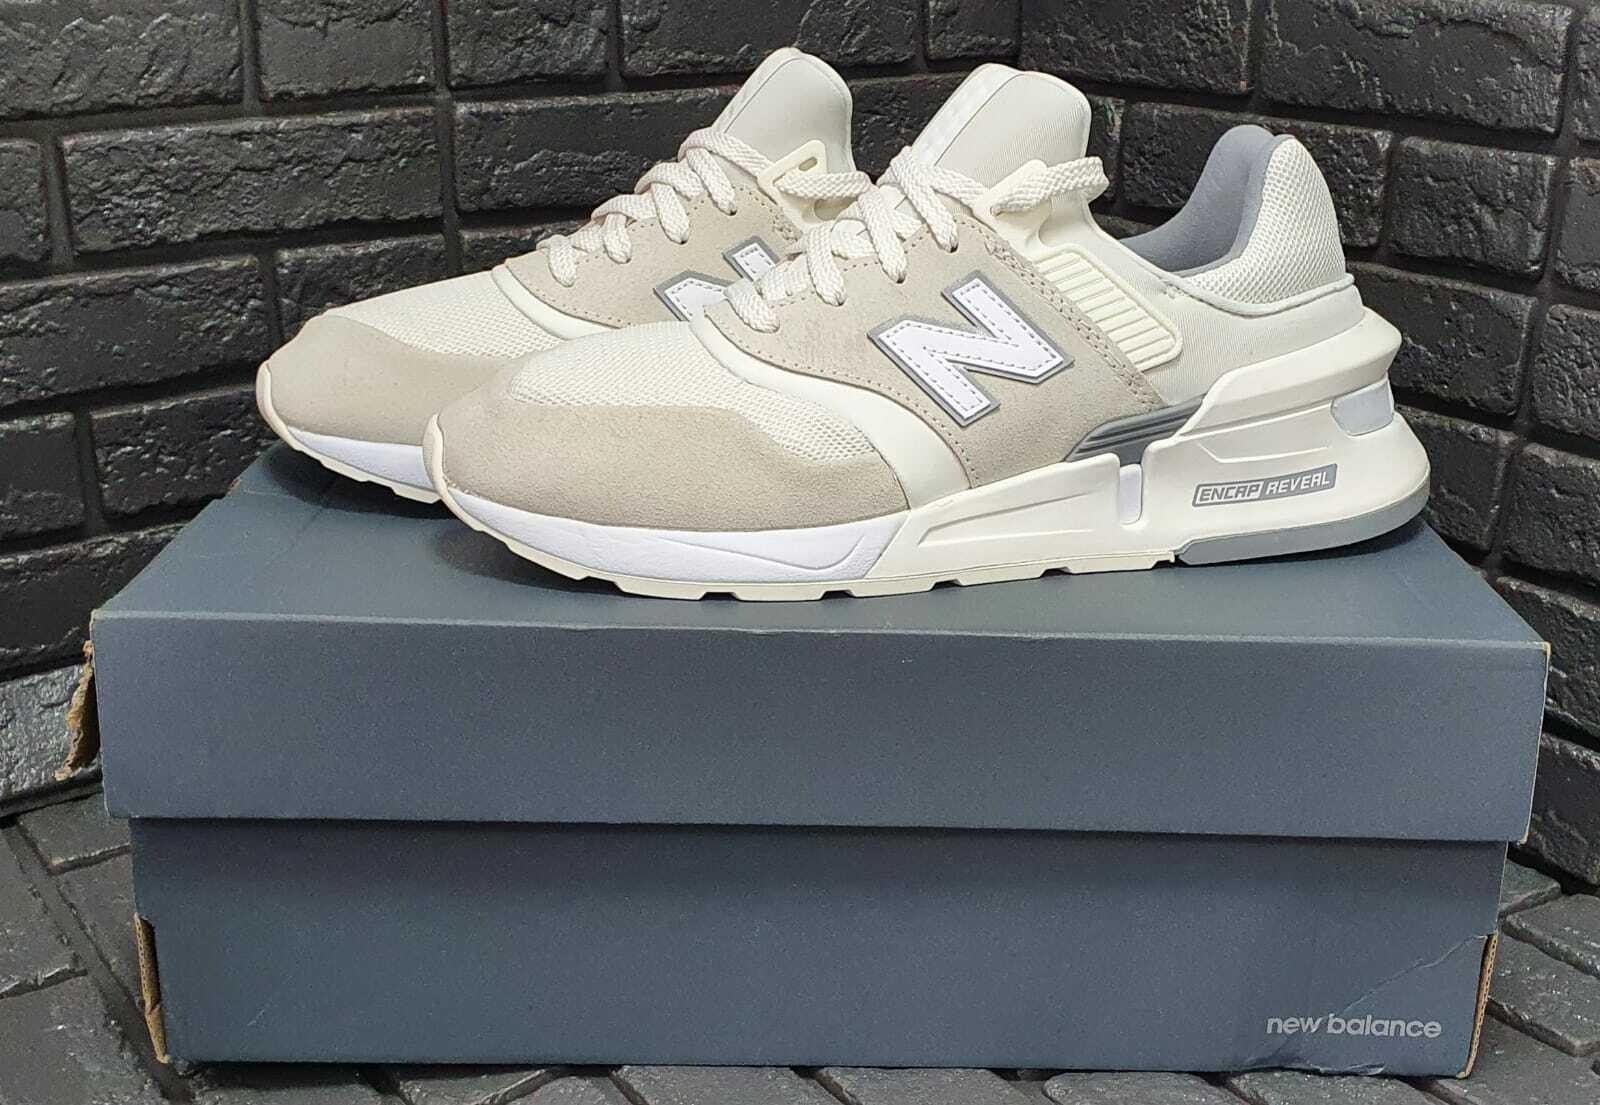 New Balance S997HO Lifestyle Shoes, White, Men's UK 8.5 RRP